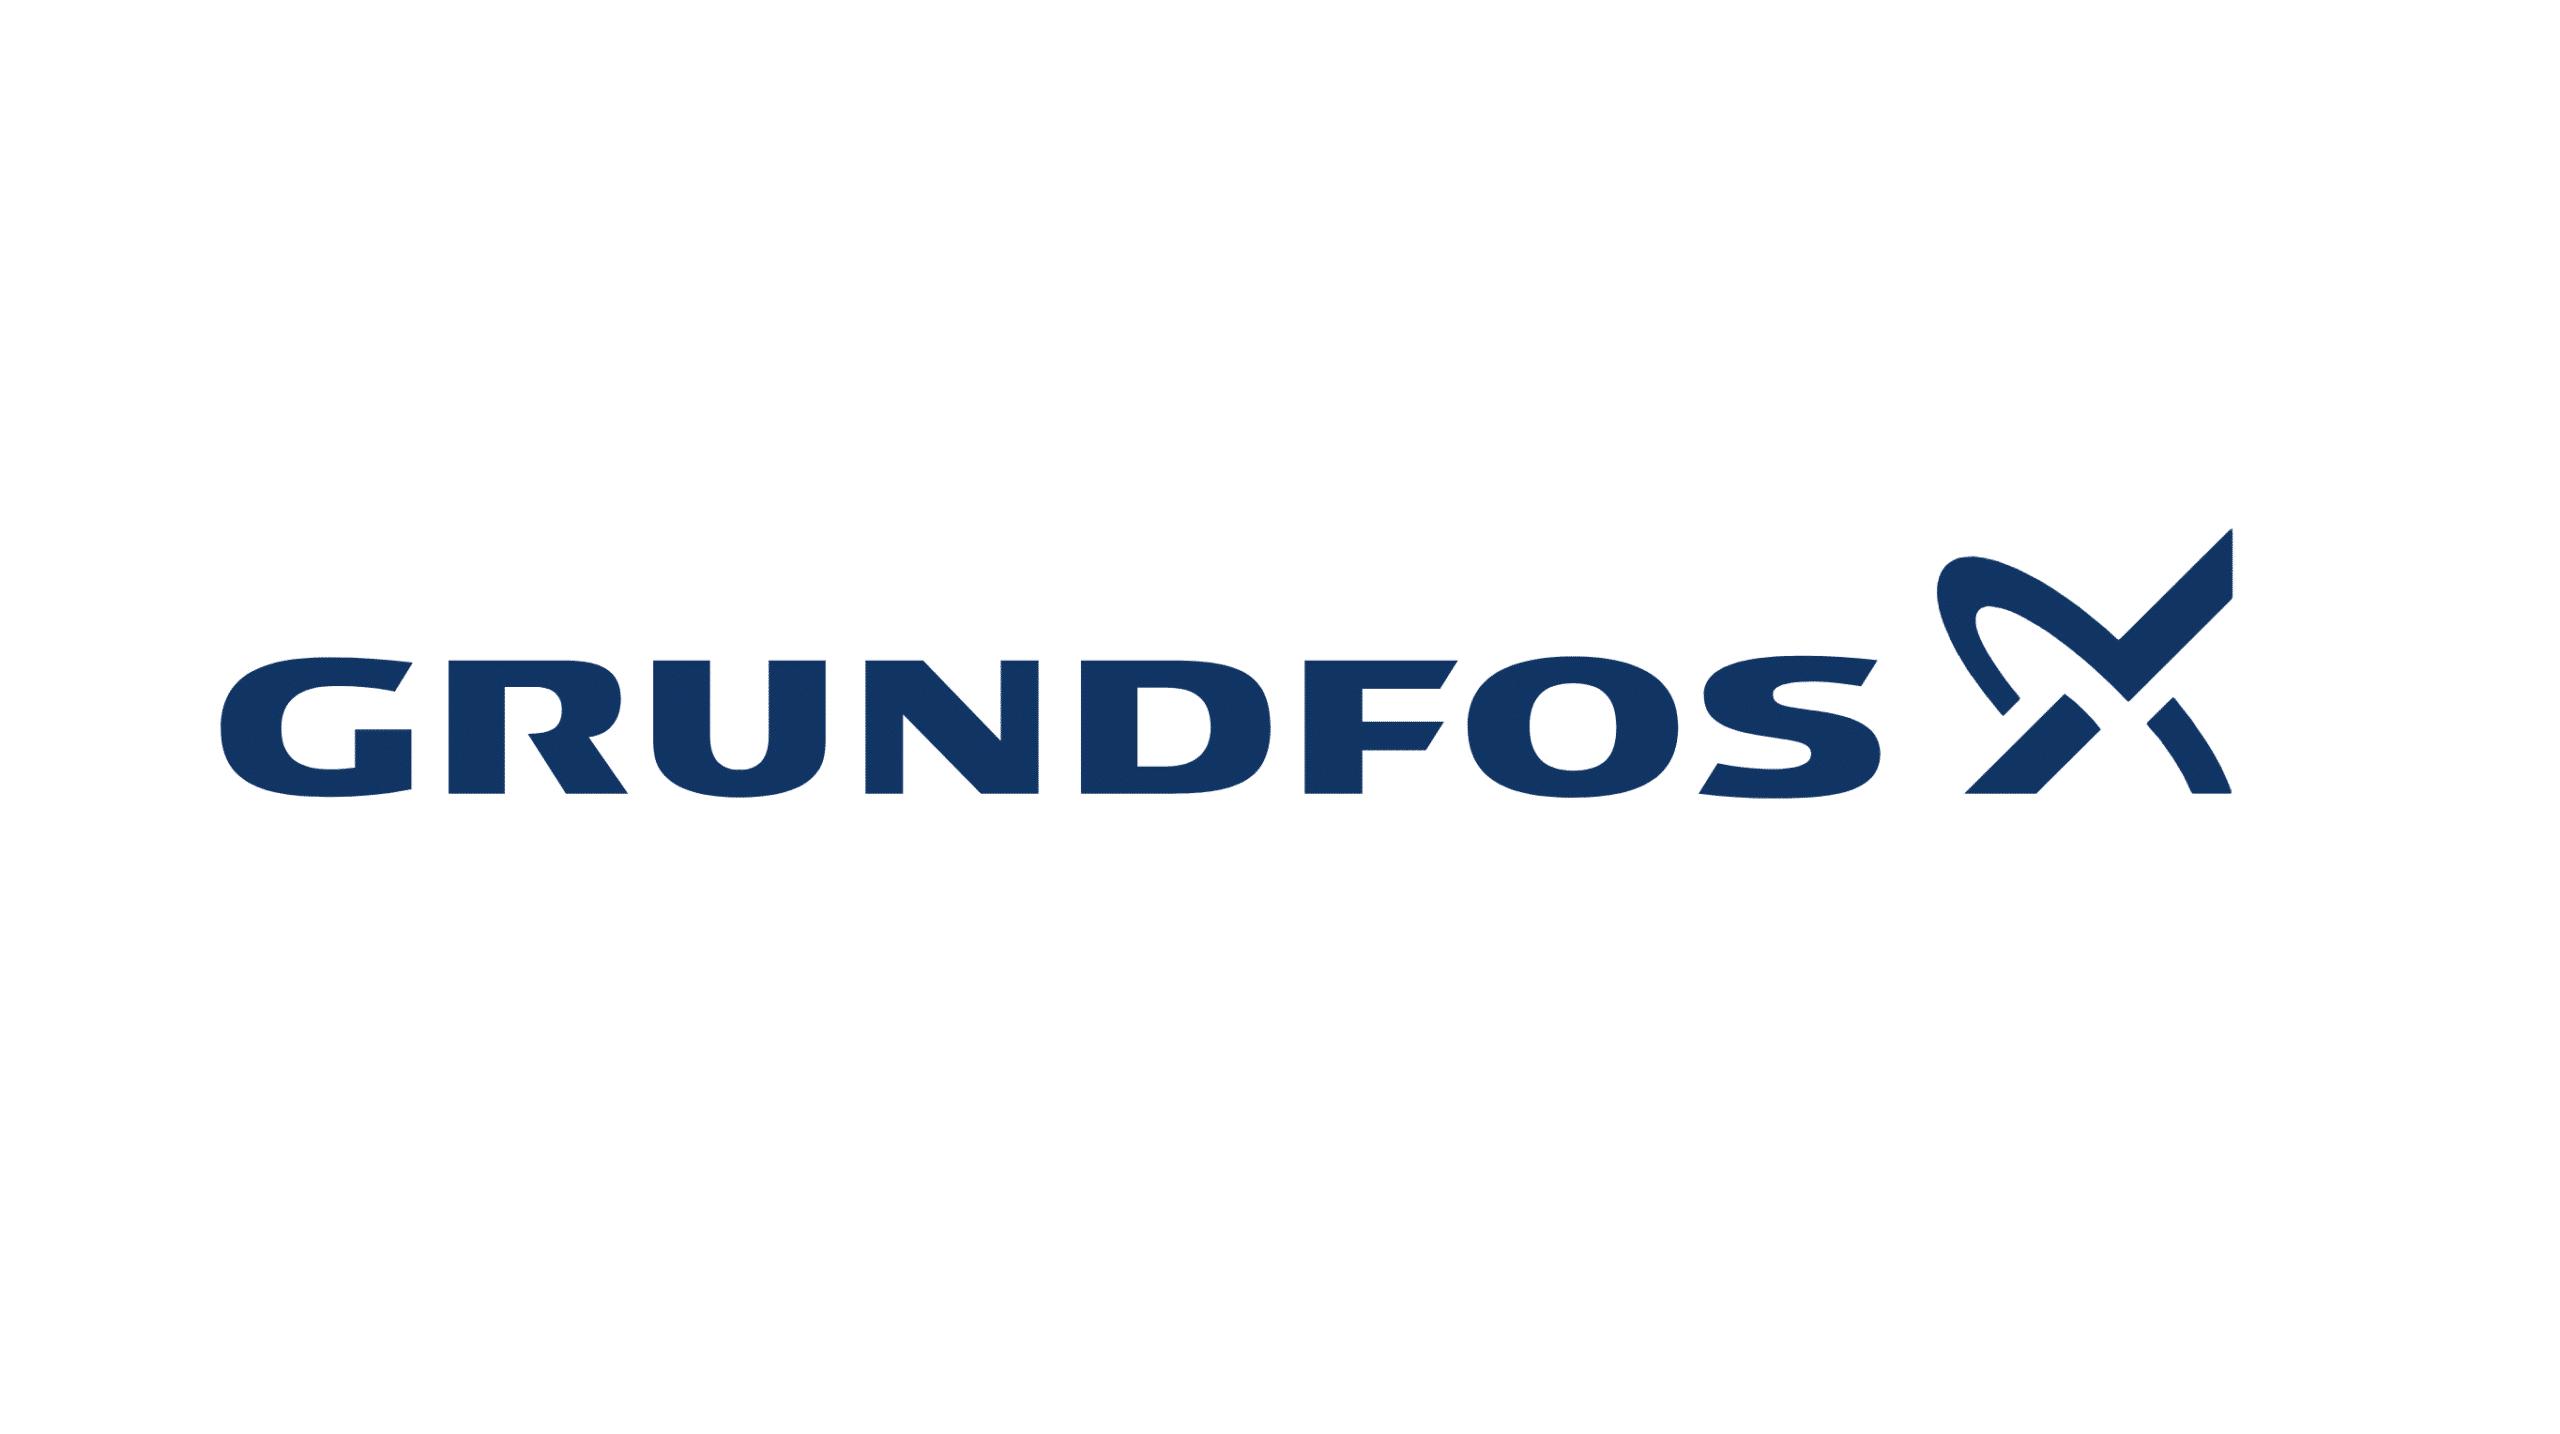 Grundfos the latest ETIM International Global Industry Member